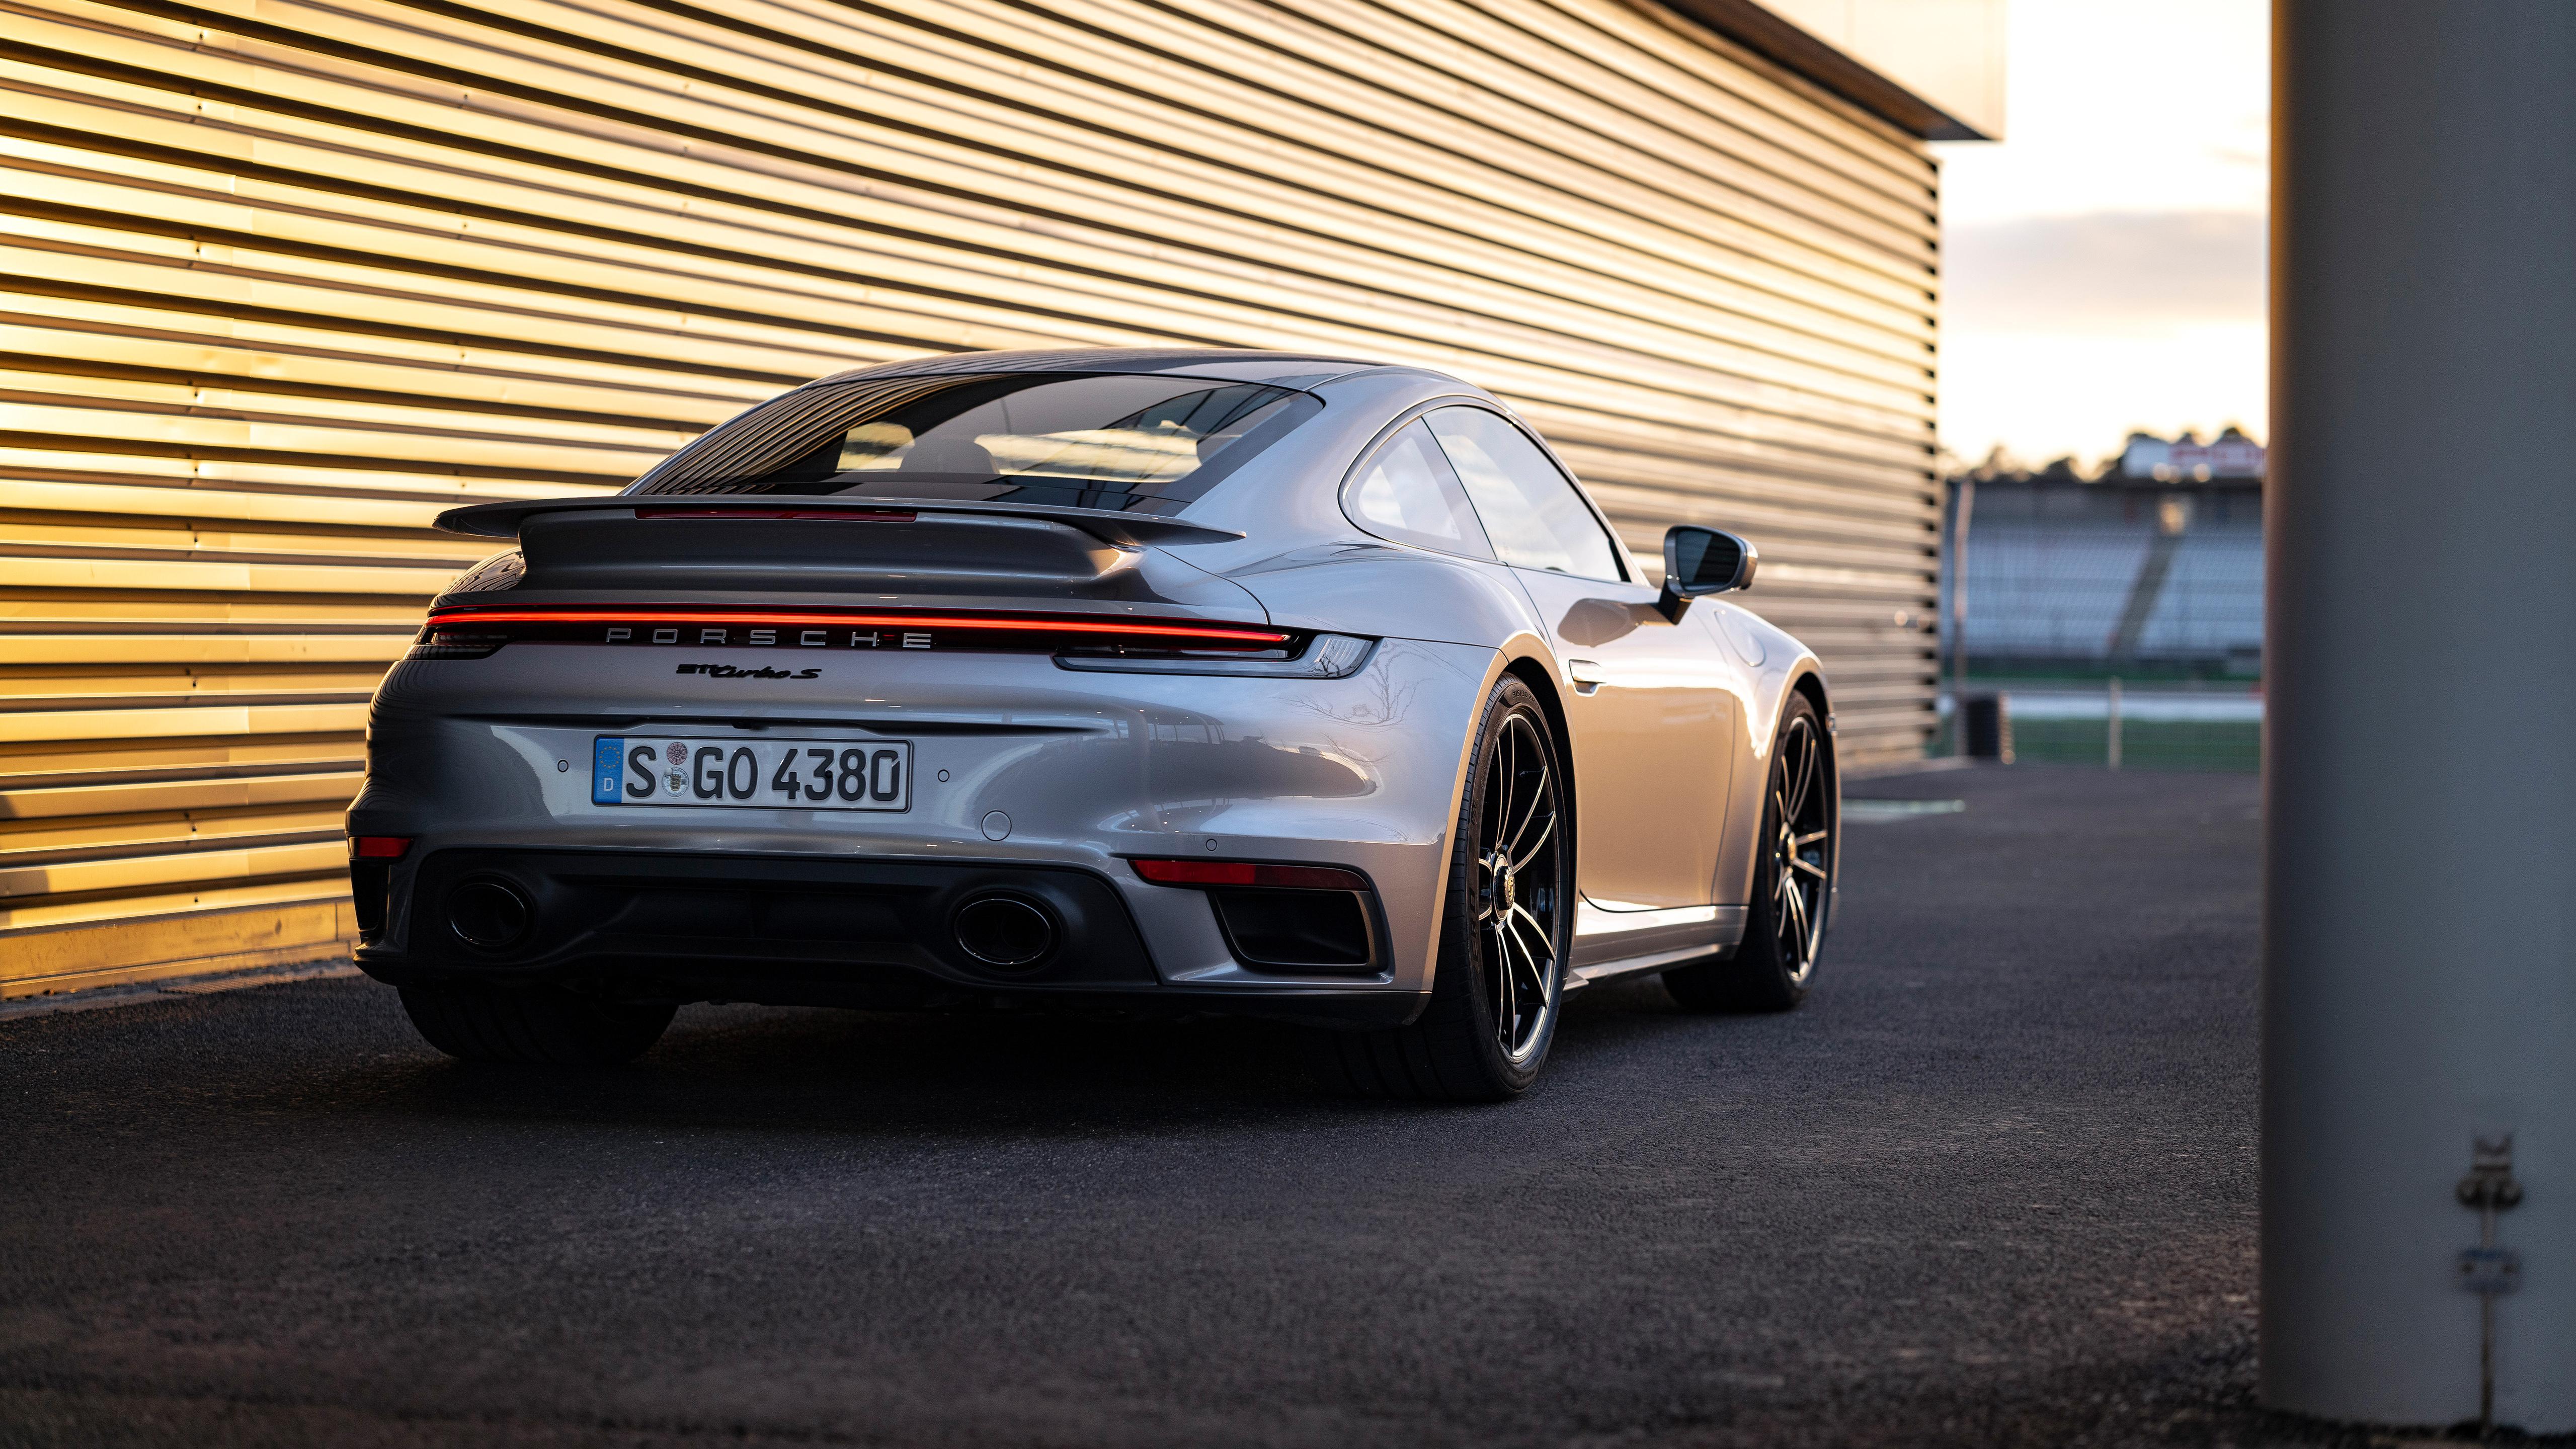 Porsche 911 Turbo S 2020 5K 2 Wallpaper HD Car Wallpapers ID 5120x2880